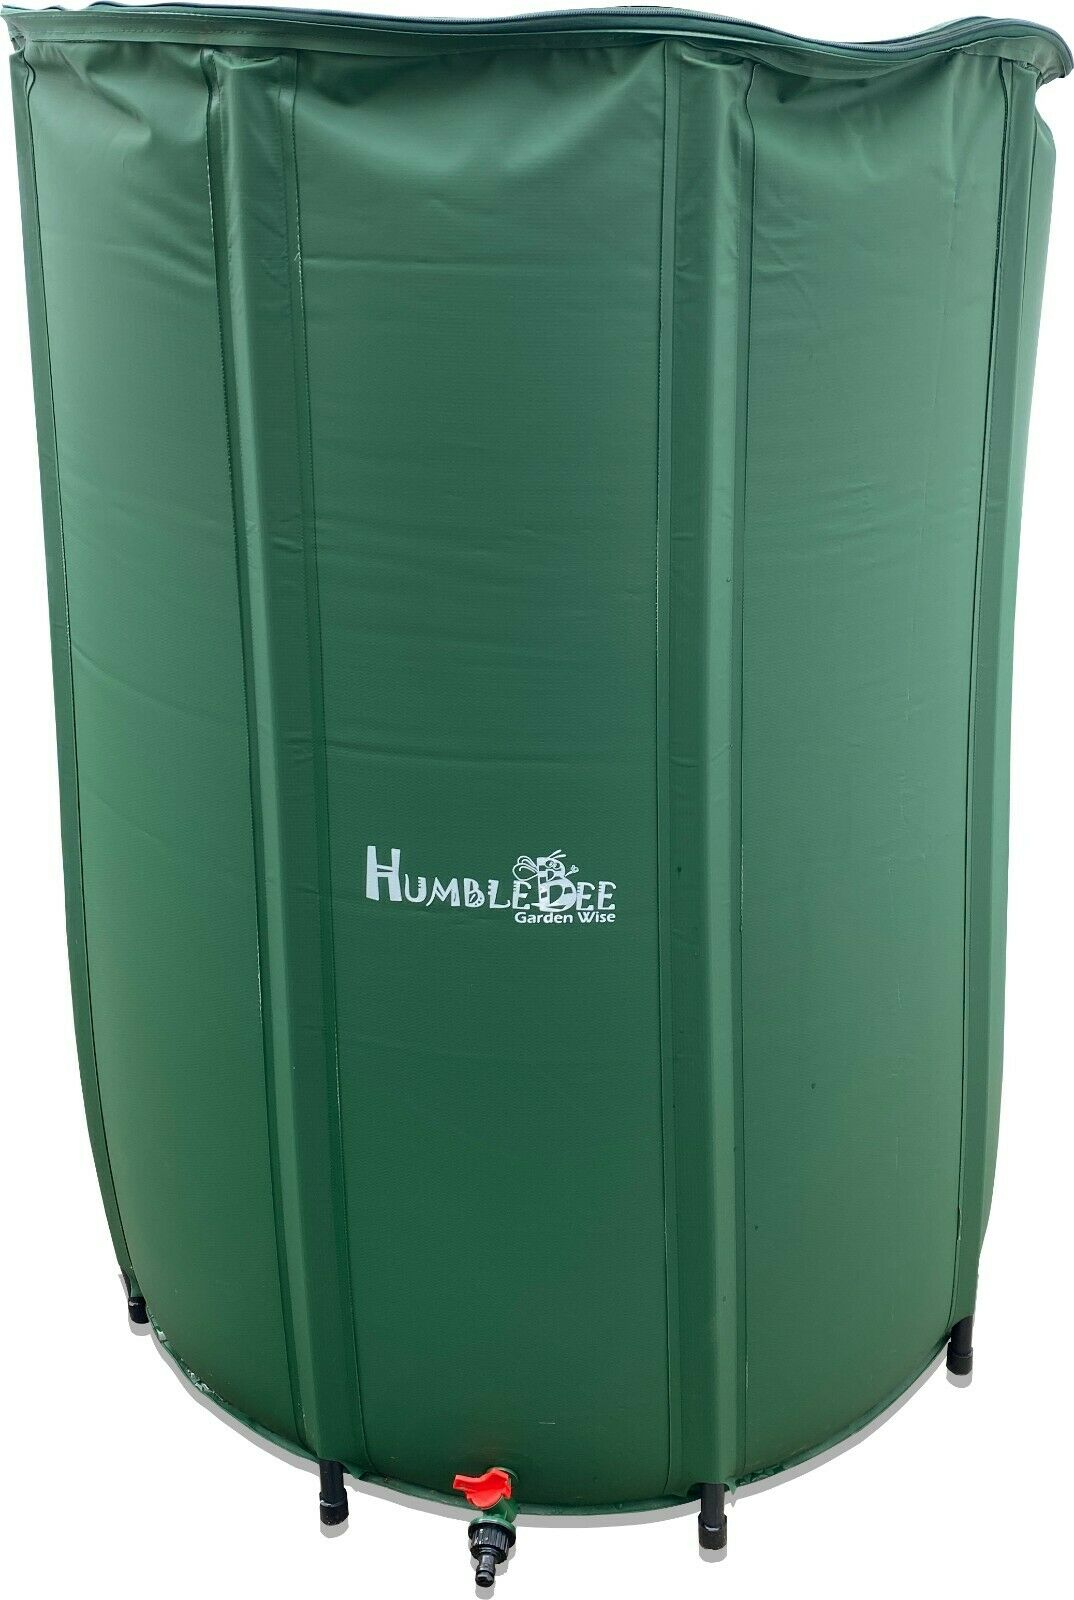 Humble Bee collapsible portable Water Tank Rain Collector 200 Gallon